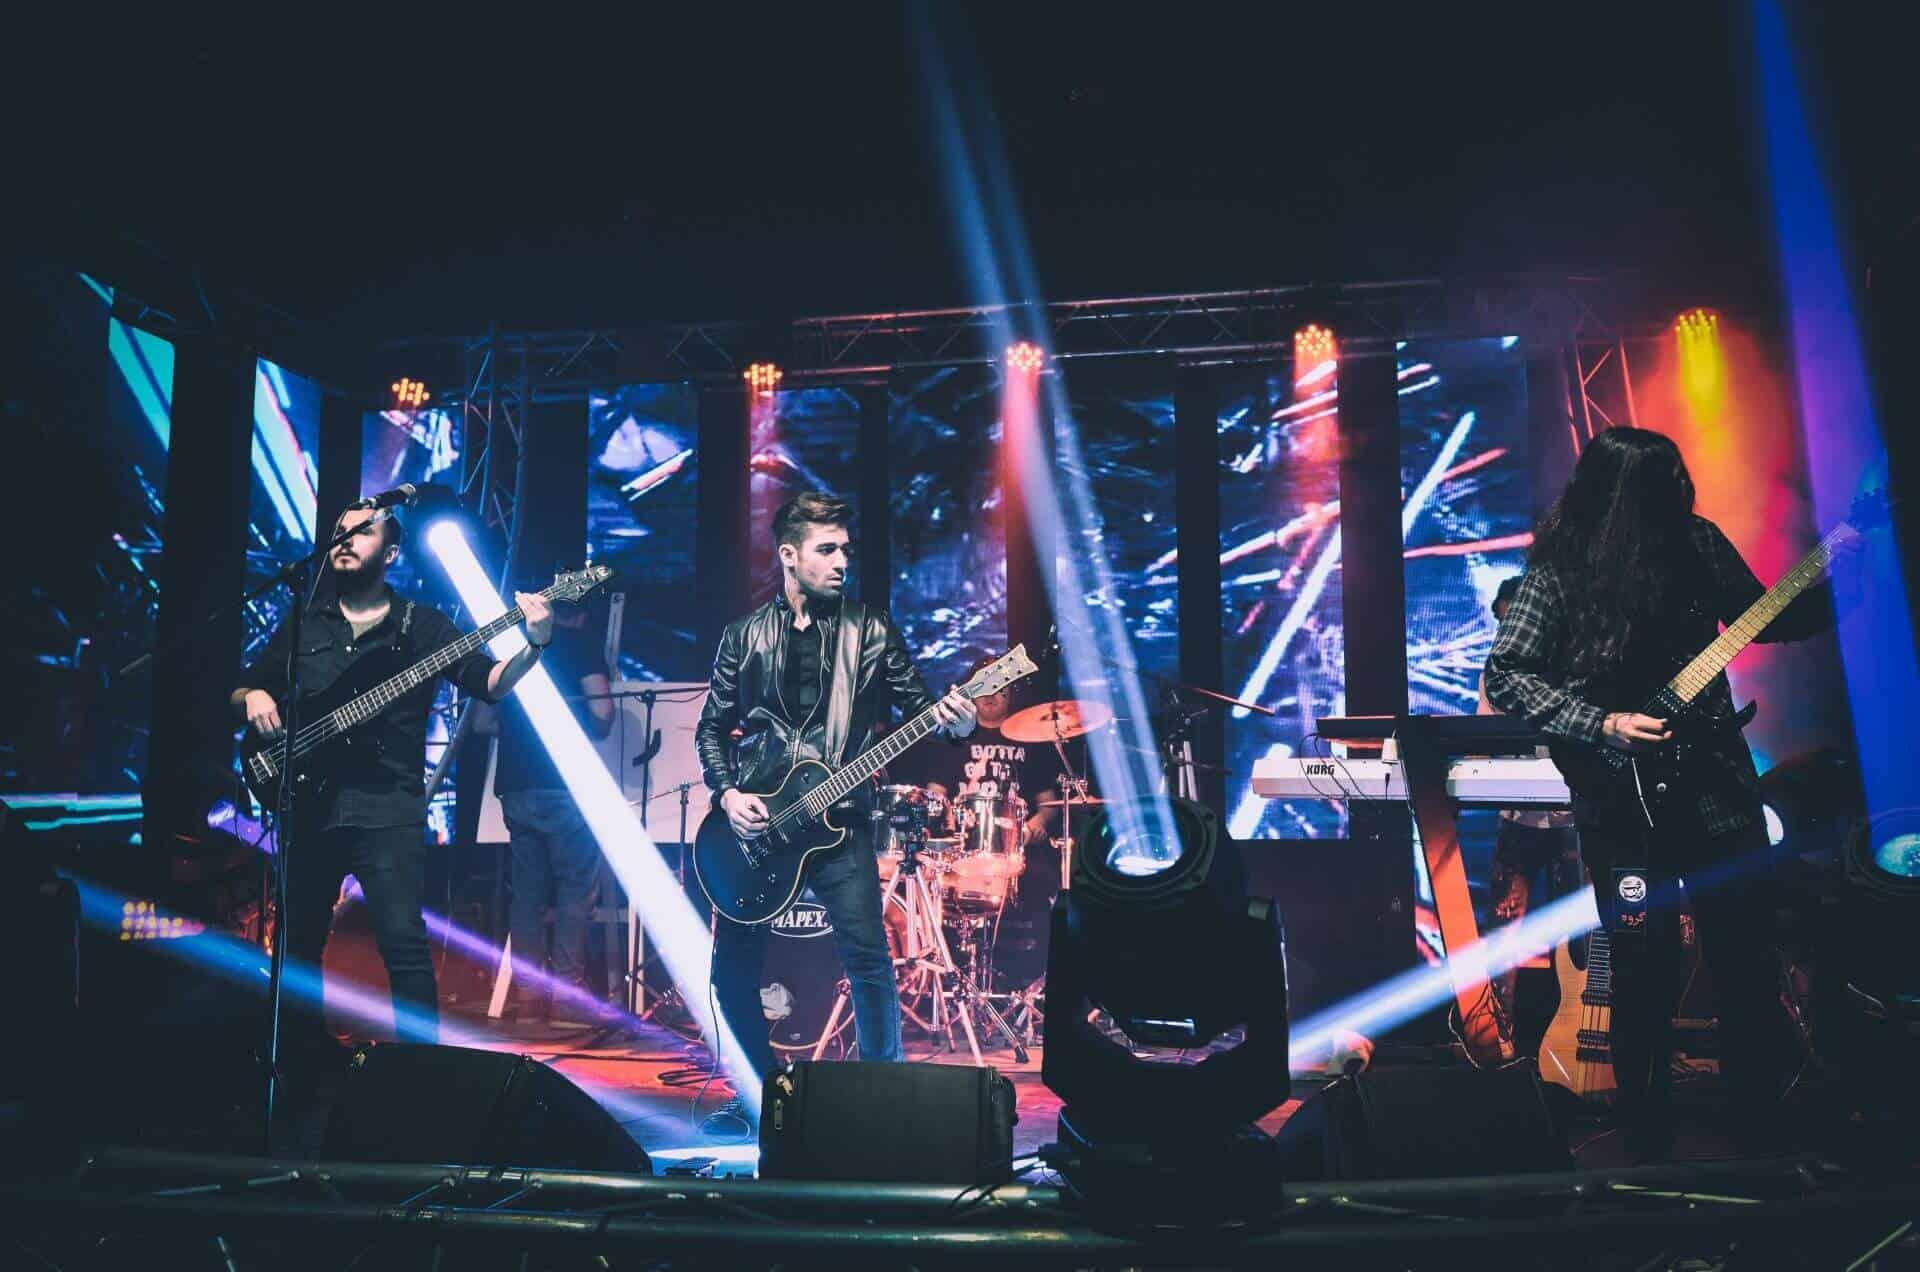 Jazz Festival 2022 is landing in Pattaya. bconceptgroup.com